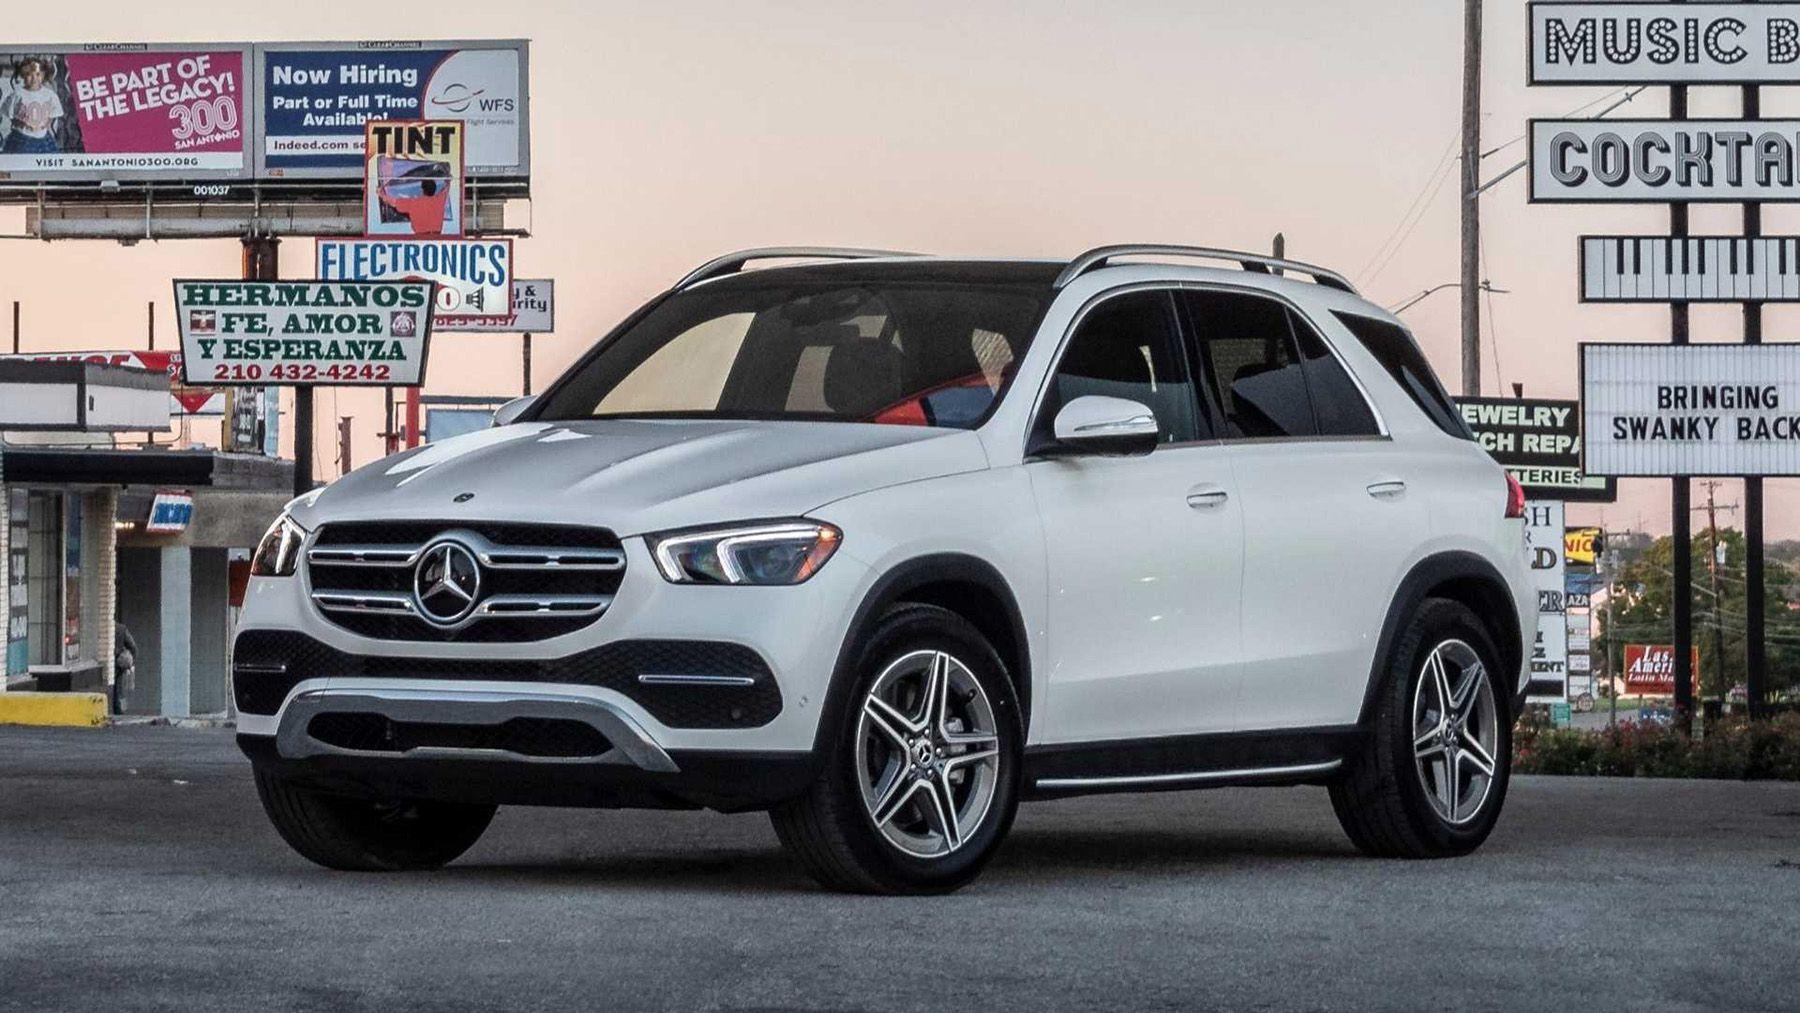 Vừa ra mắt, Mercedes-Benz GLE 2020 đã bị triệu hồi để sửa lỗi